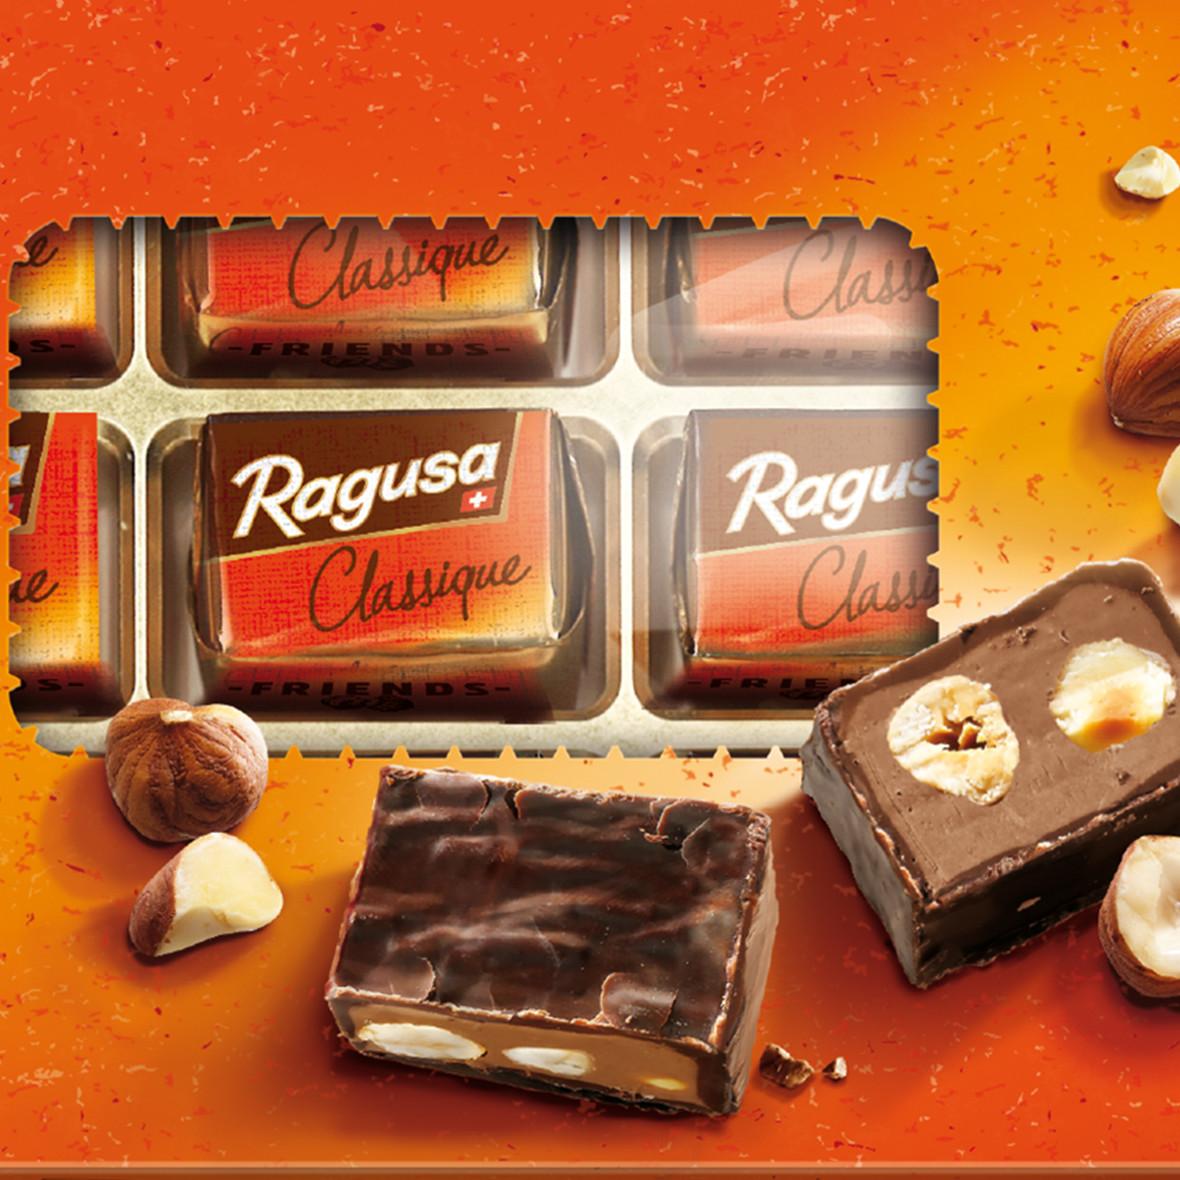 Chocolats Camille Bloch – Ragusa For Friends Classique